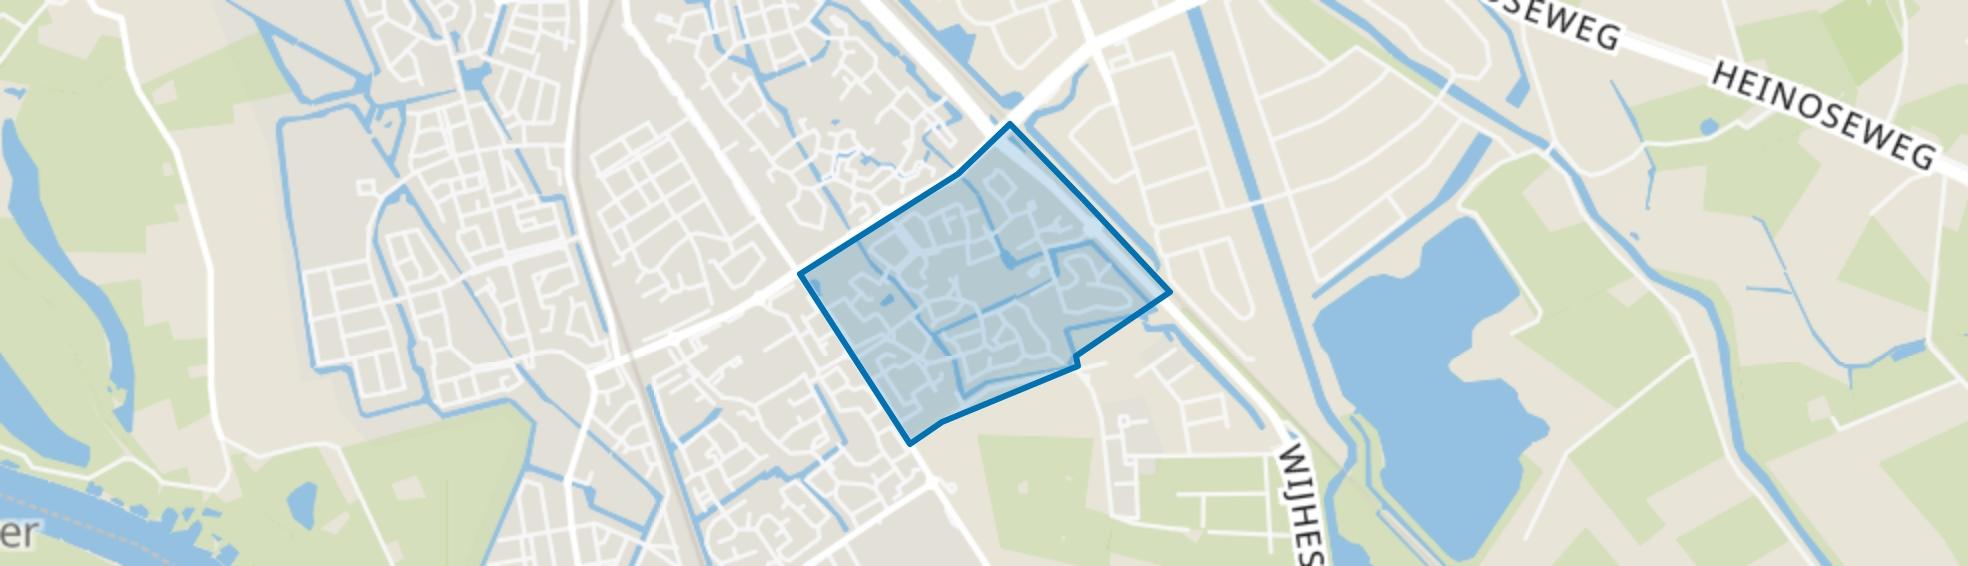 Gerenbroek, Zwolle map